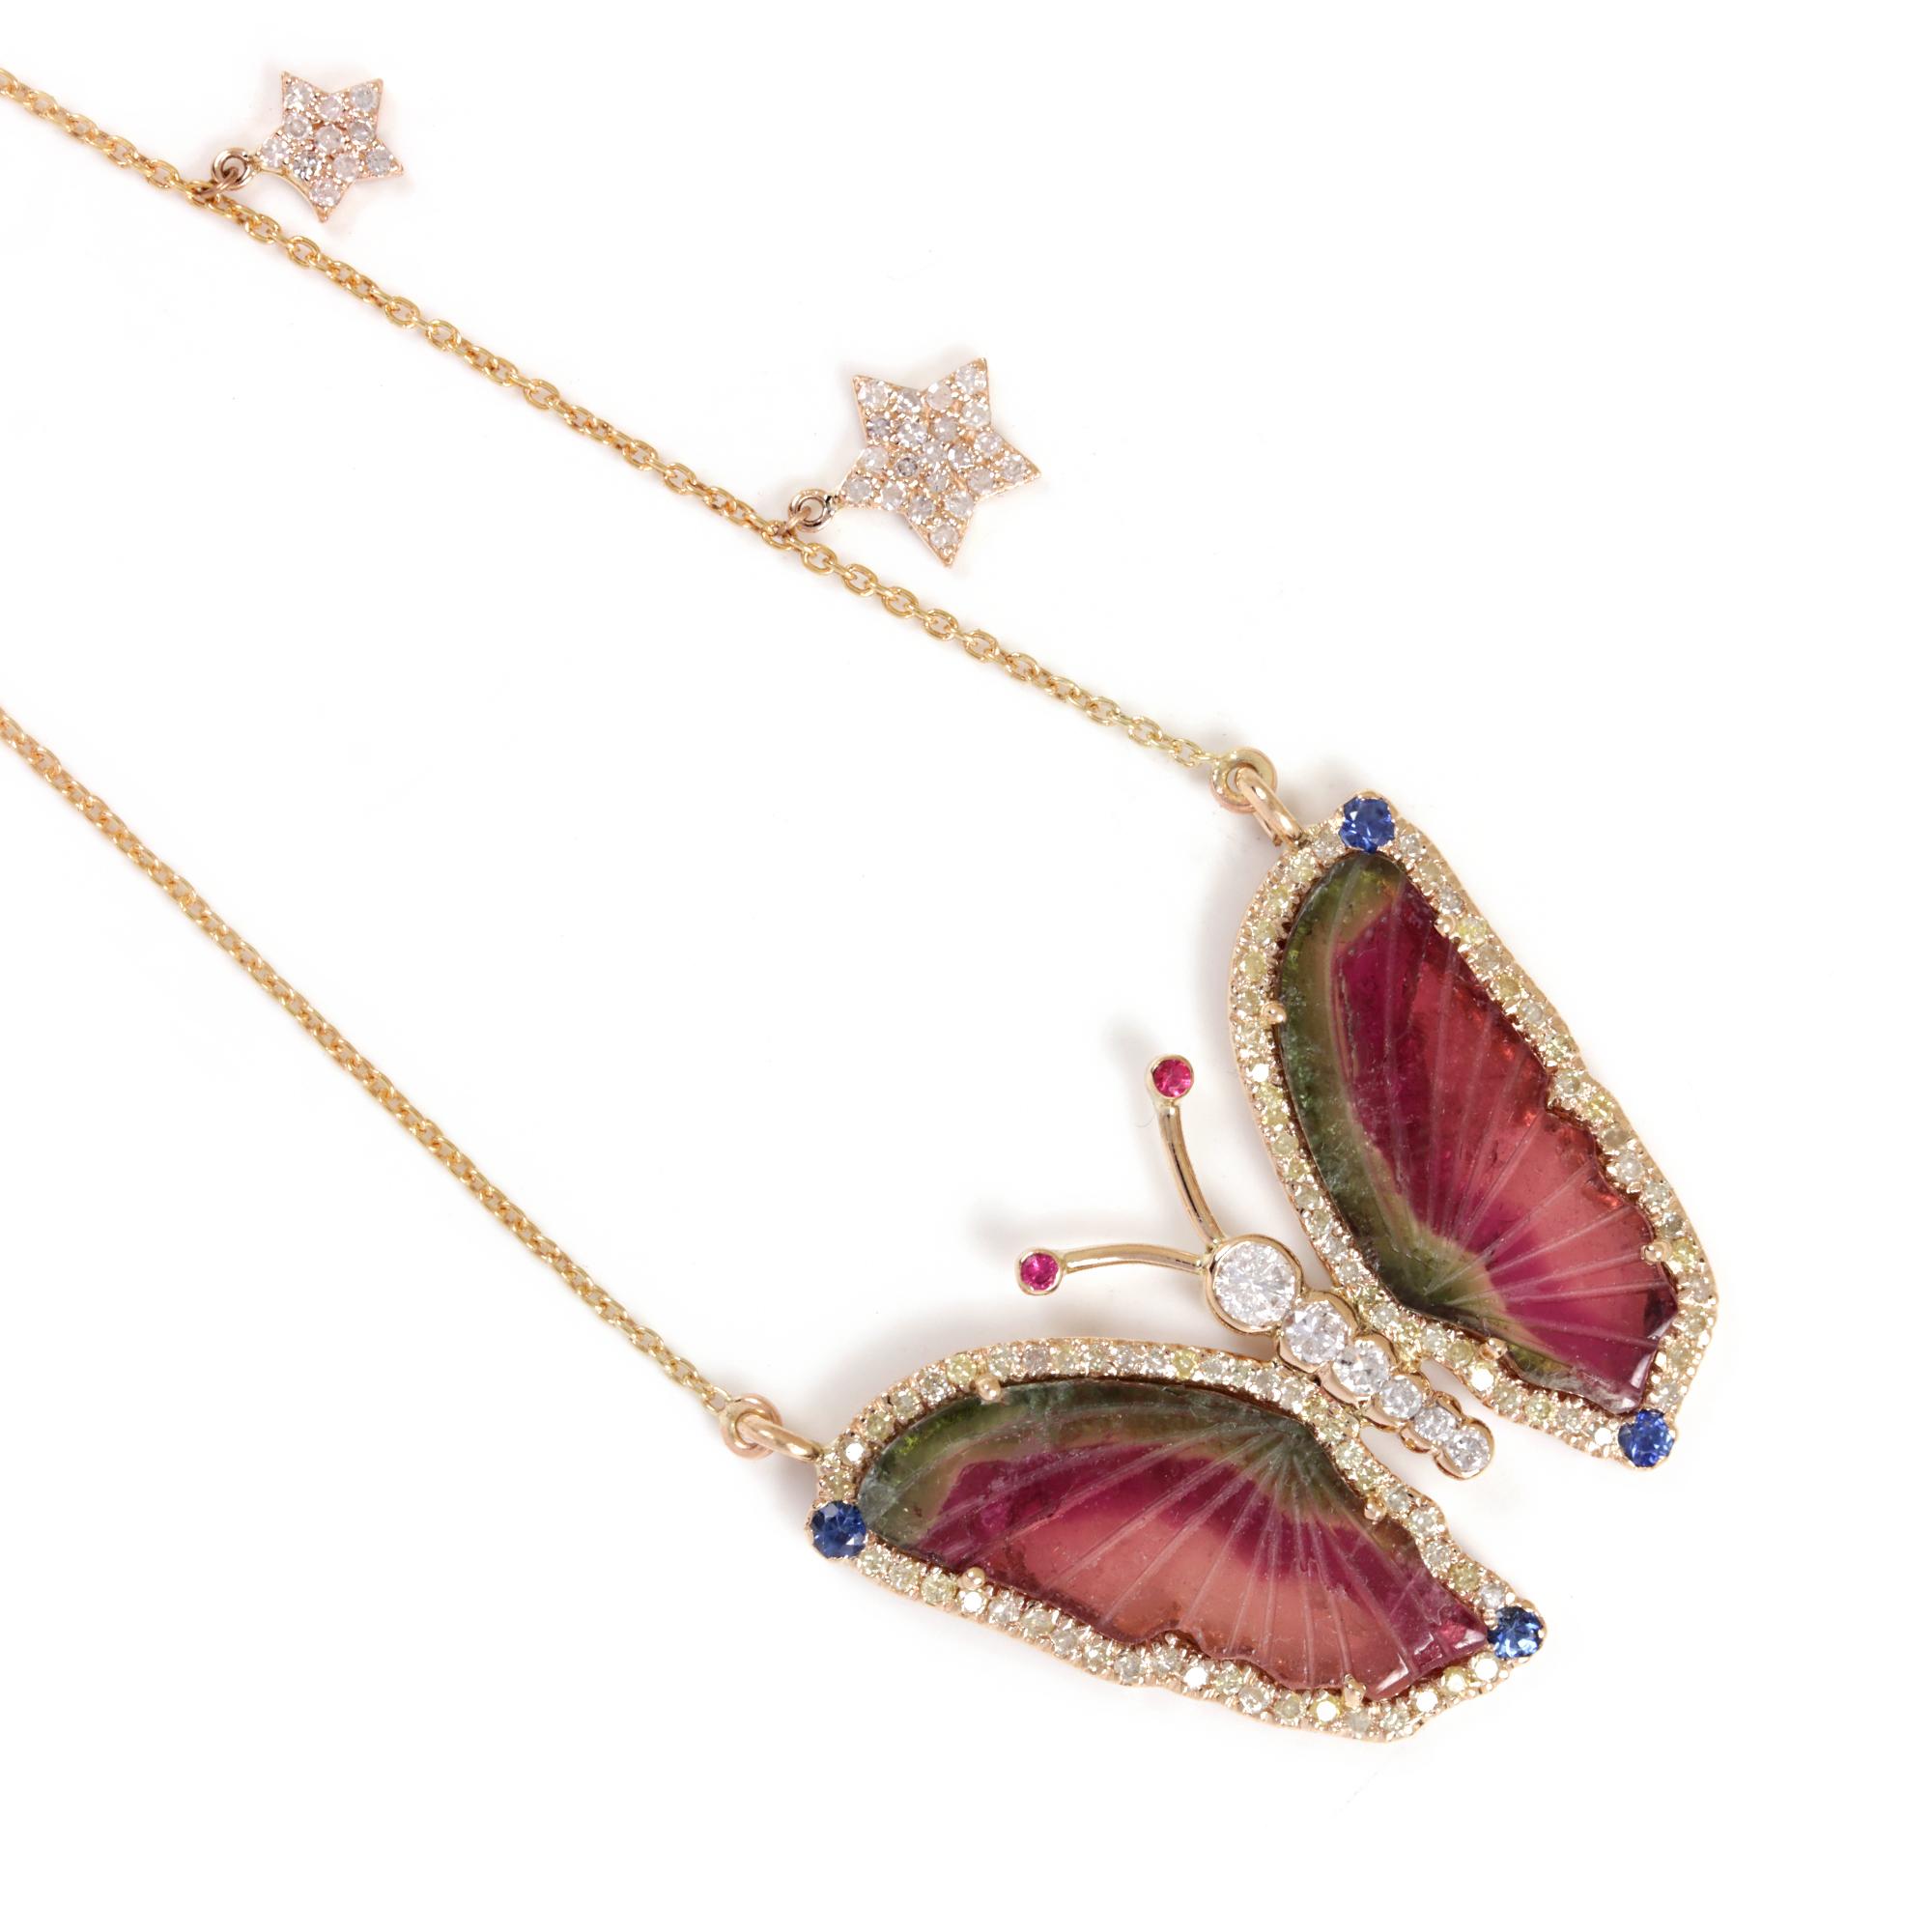 Tourmaline Gemstone Sapphire Ruby Butterfly Pendant Necklace Pave Diamond 14K Solid Gold Jewelry